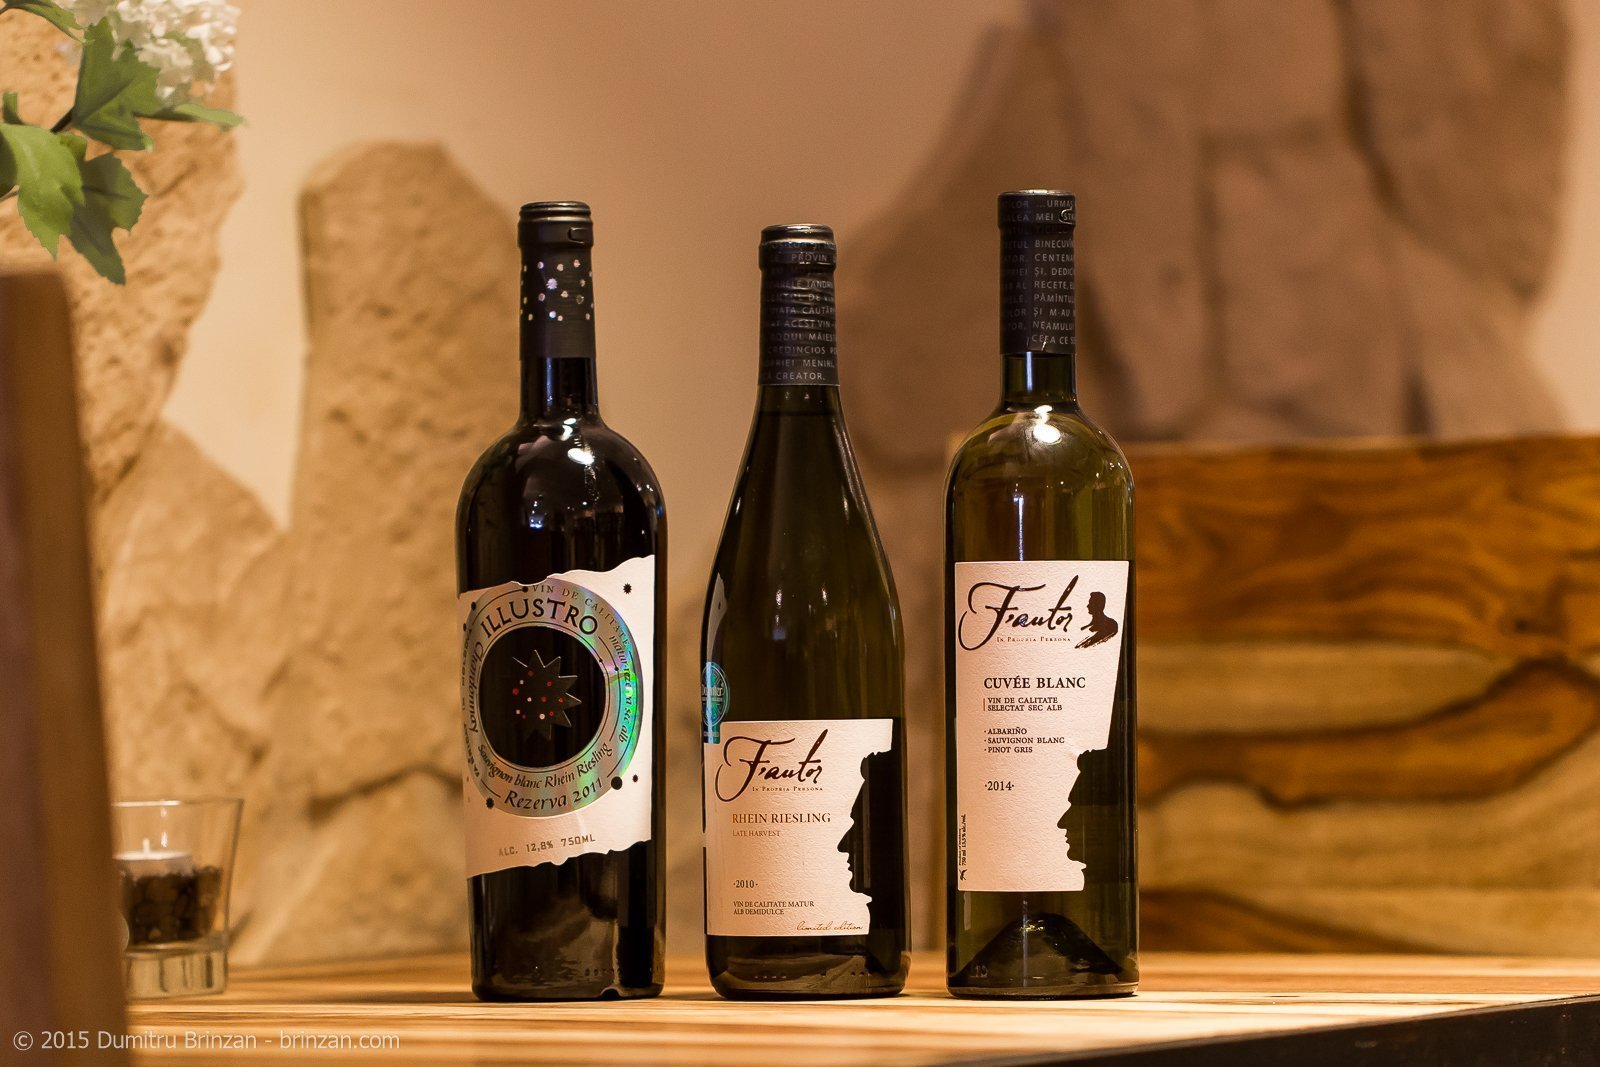 Bottles of F'autor Illustro 2011, F'autor Riesling Late Harvest 2010 and F'autor Cuvee Blanc 2014